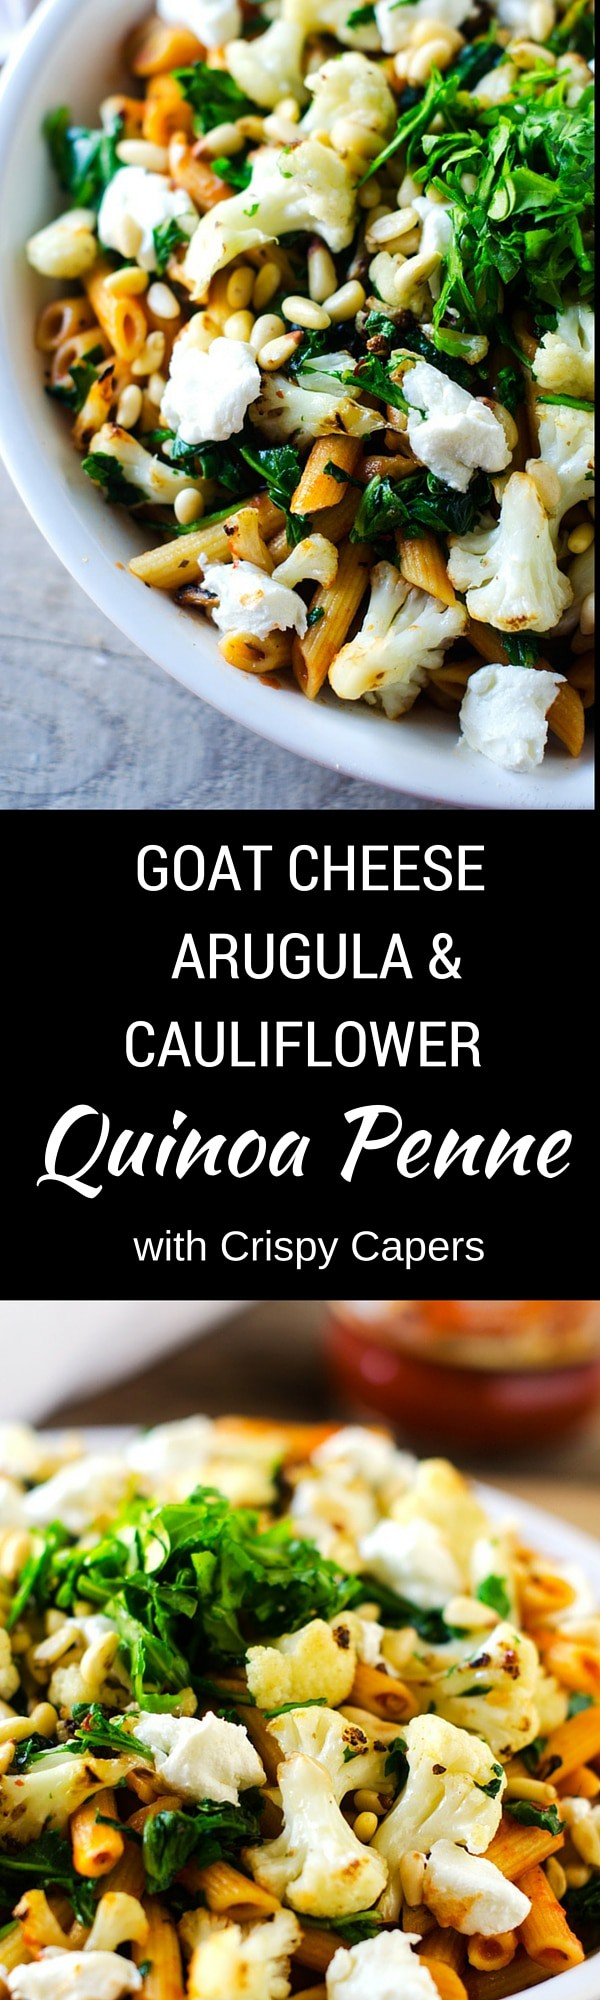 Goat Cheese, Arugula & Cauliflower Quinoa Penne with Crispy Capers